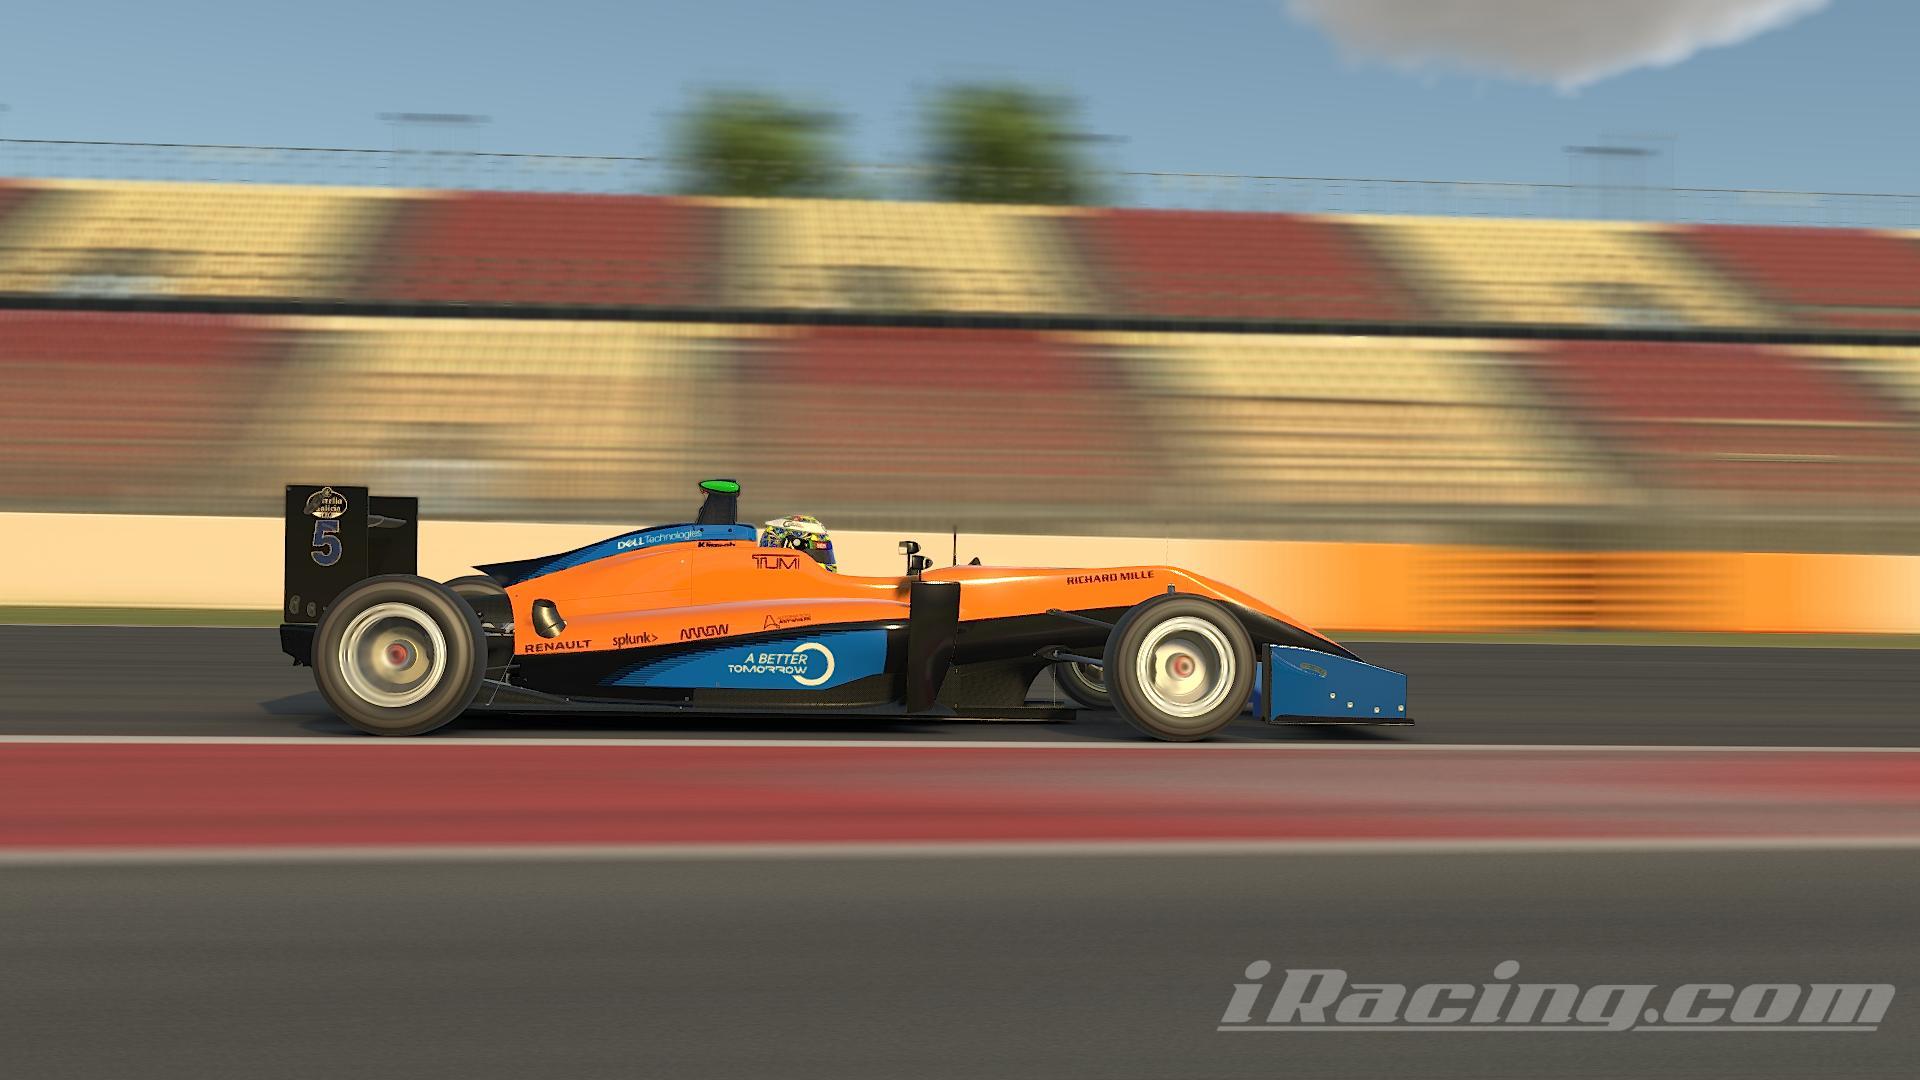 Preview of McLaren MCL35 - 2020 F1 Car by Søren Eriksen